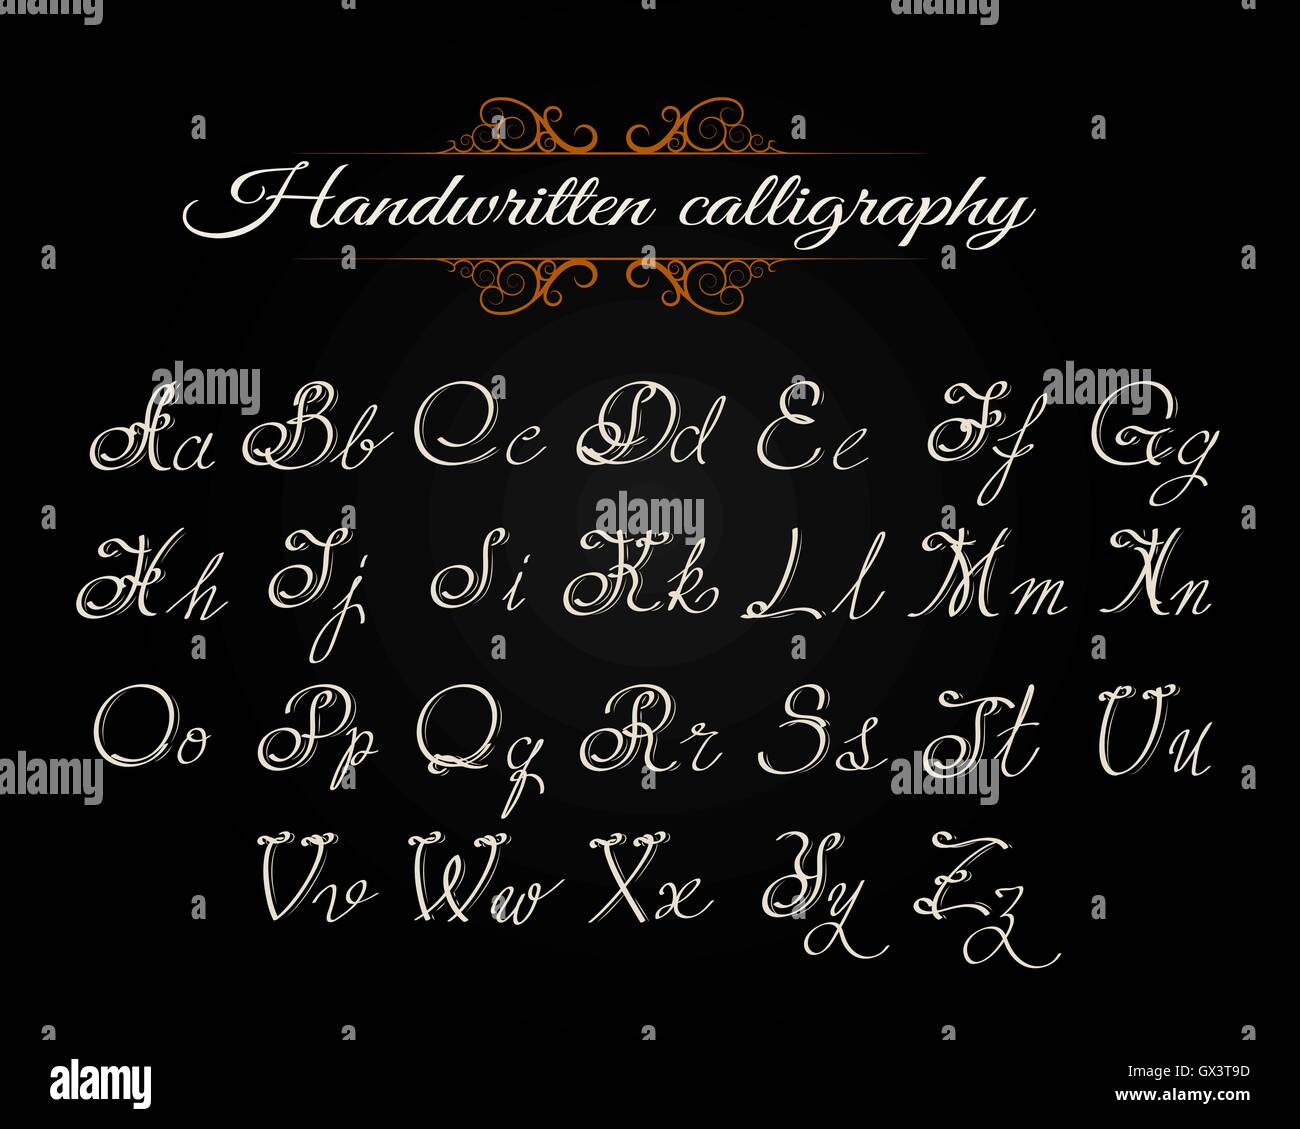 handwritten calligraphy alphabet latin letters on black